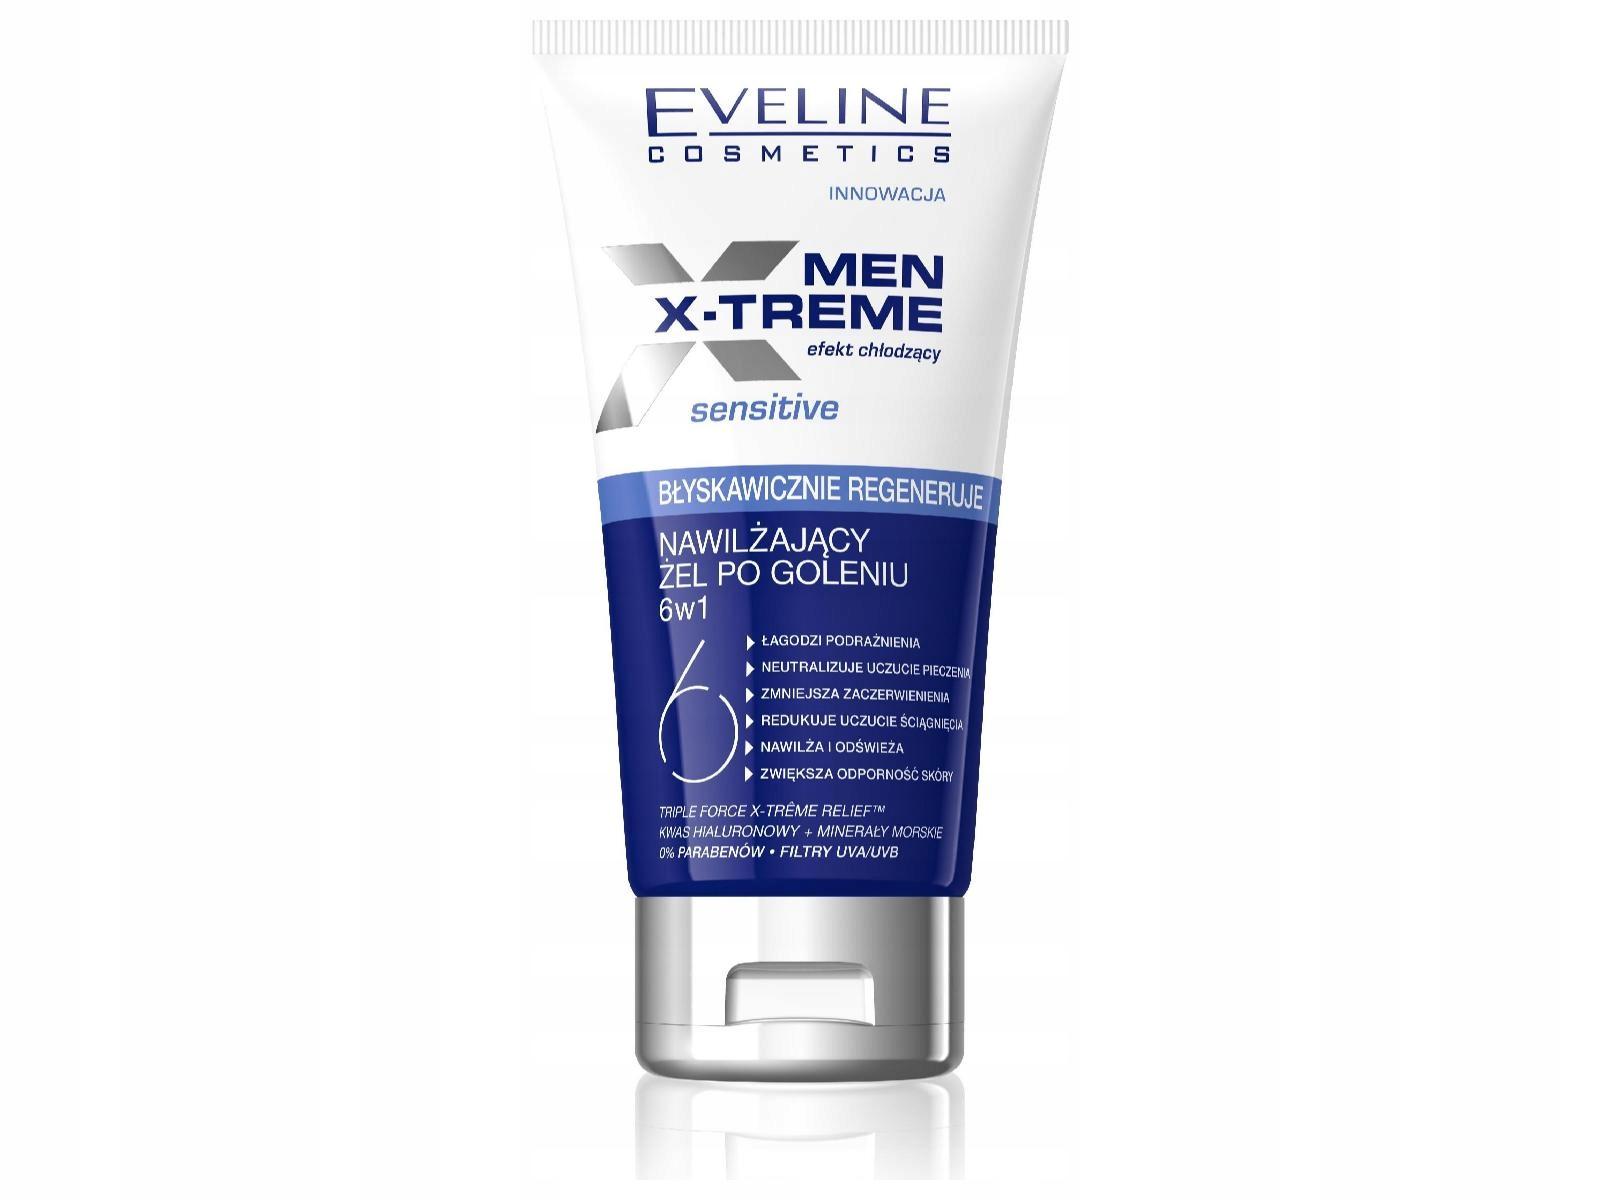 Eveline Men X-Treme 6w1 Żel p/goleniu 150ml